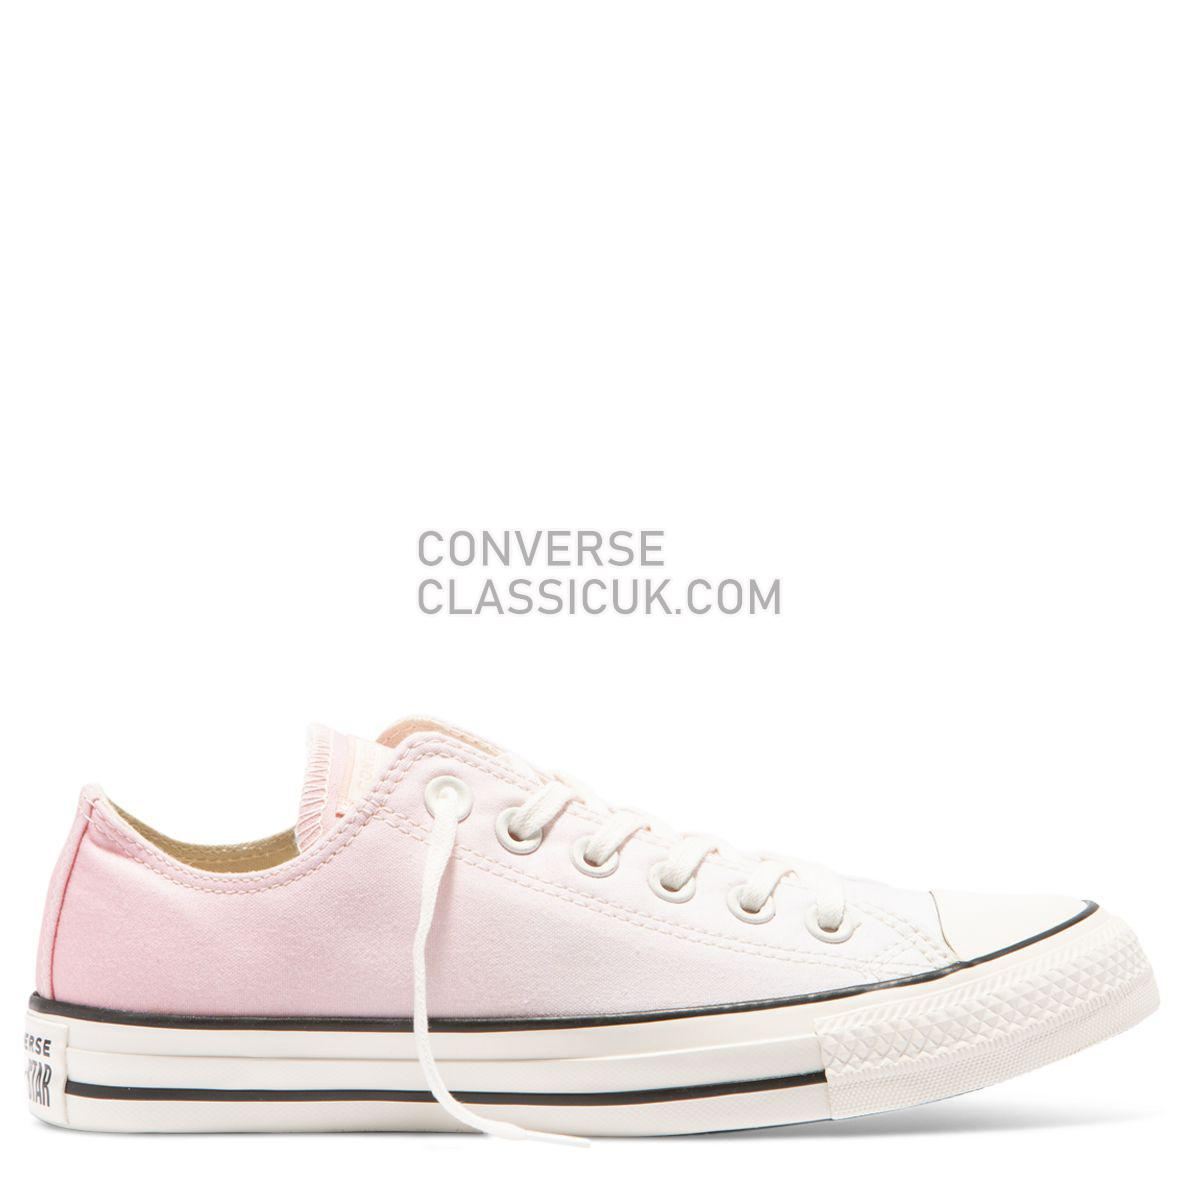 Converse Chuck Taylor All Star Ombre Wash Low Top Storm Pink Womens 561723 Storm Pink/Egret/Egret Shoes